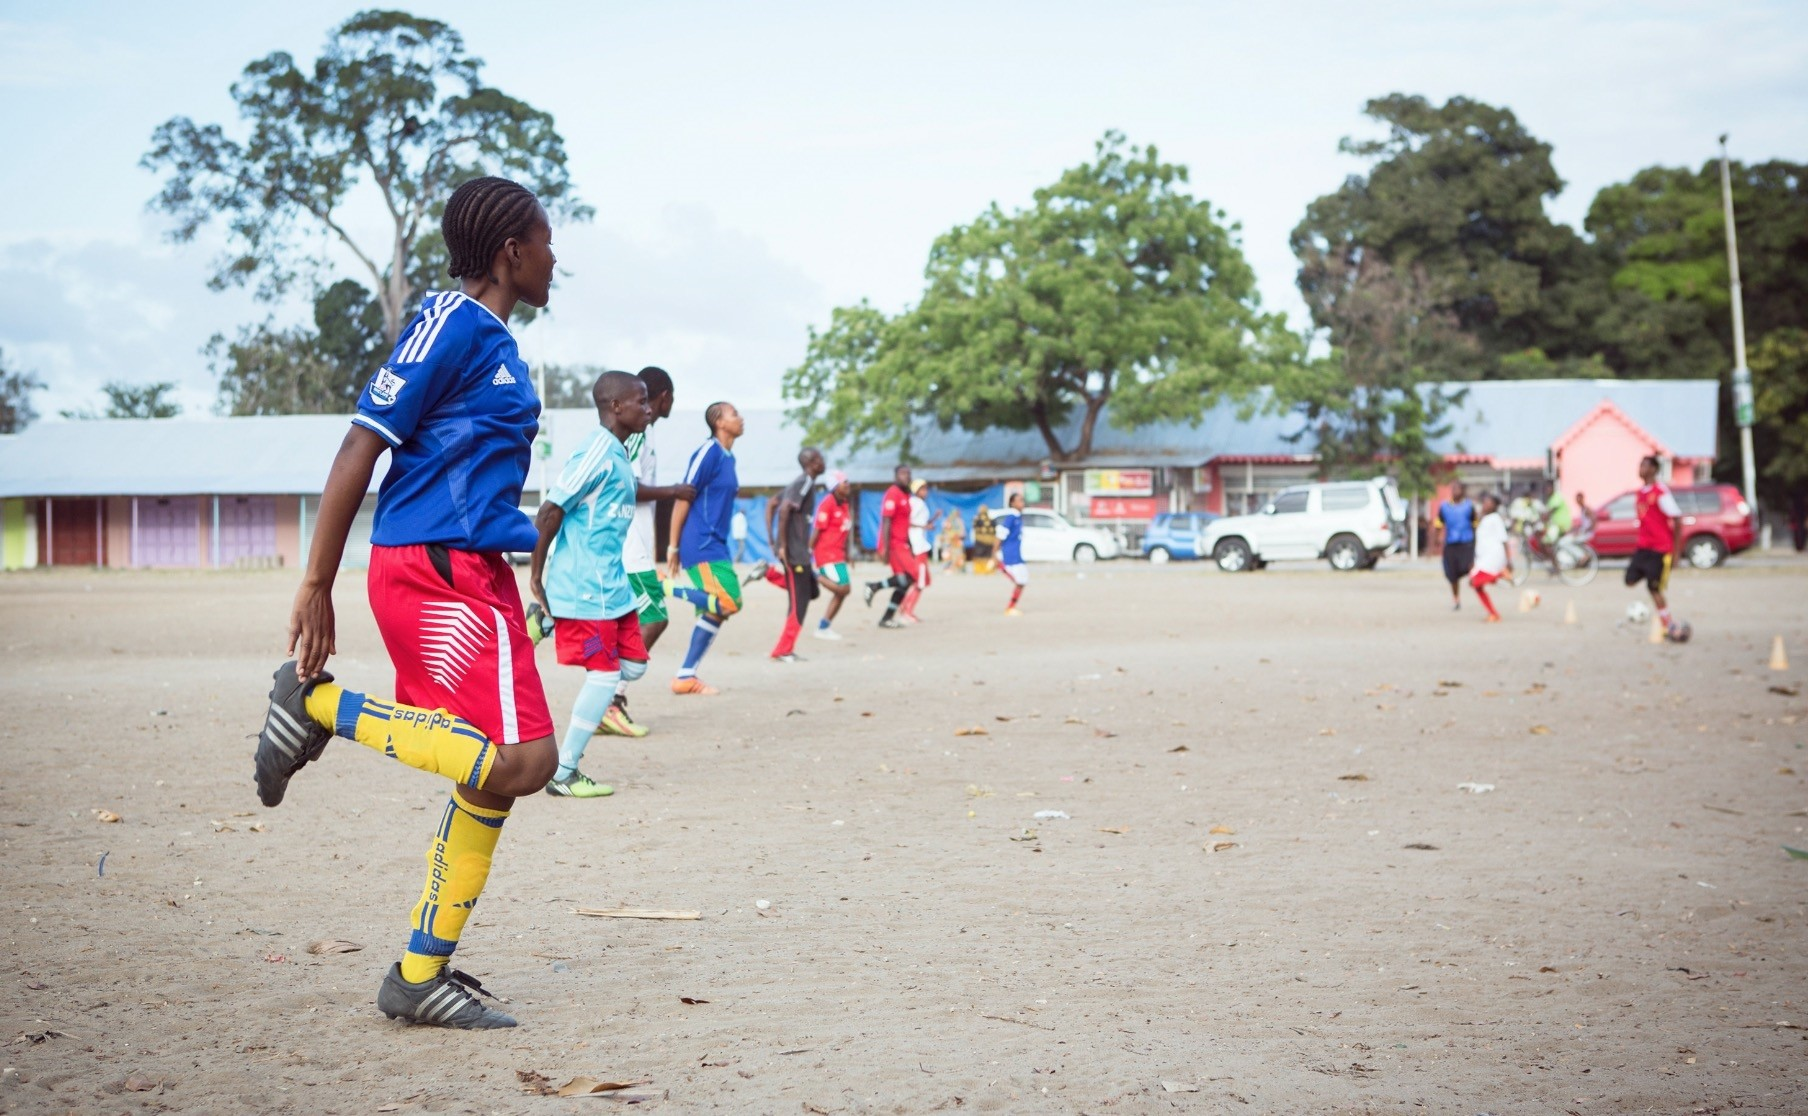 u201cNew Generation Queens: A Zanzibar Soccer Storyu201d